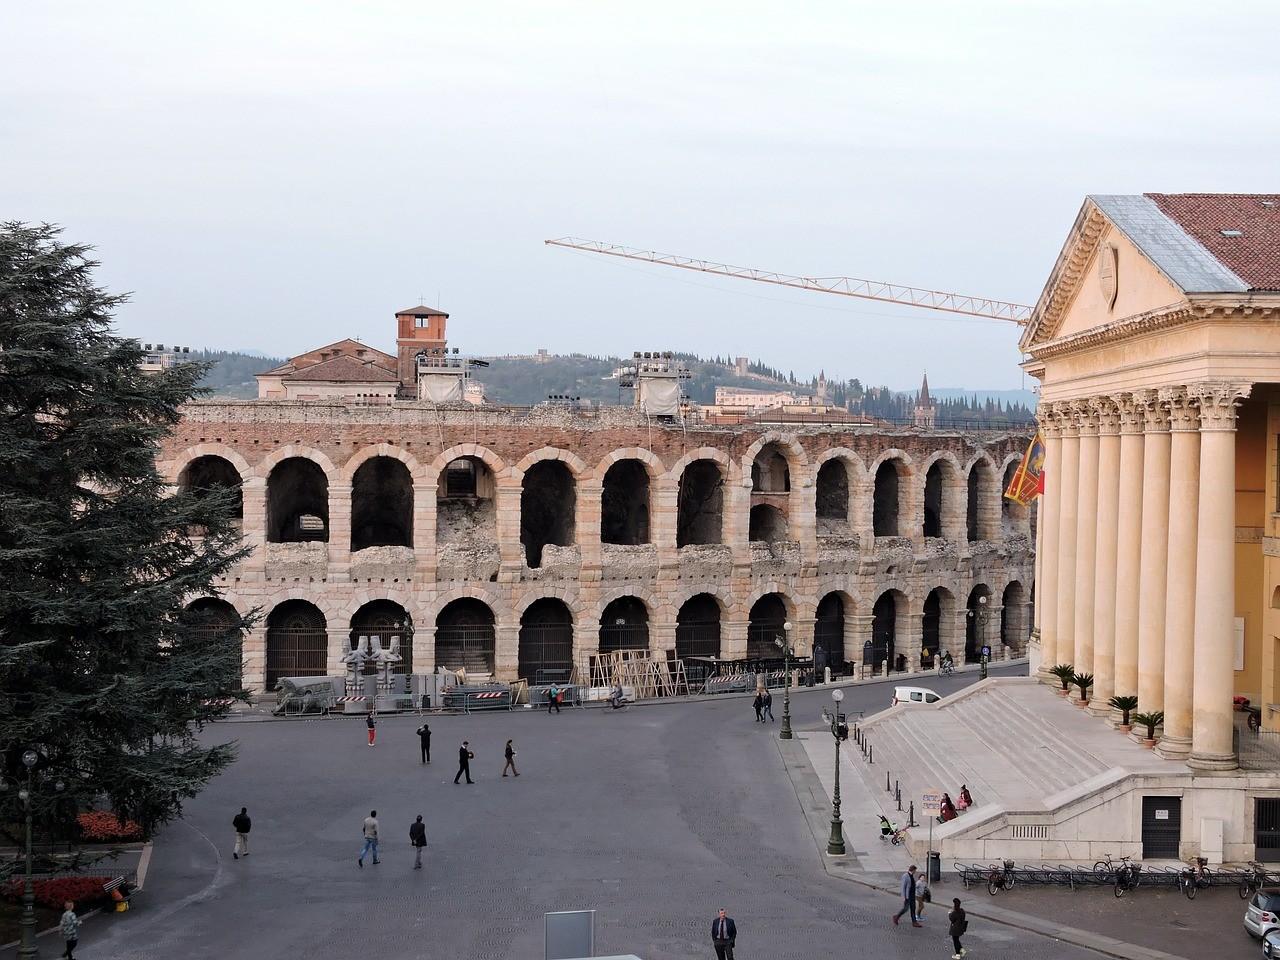 Esperienza Erasmus a Verona (Italia), di Alejandro